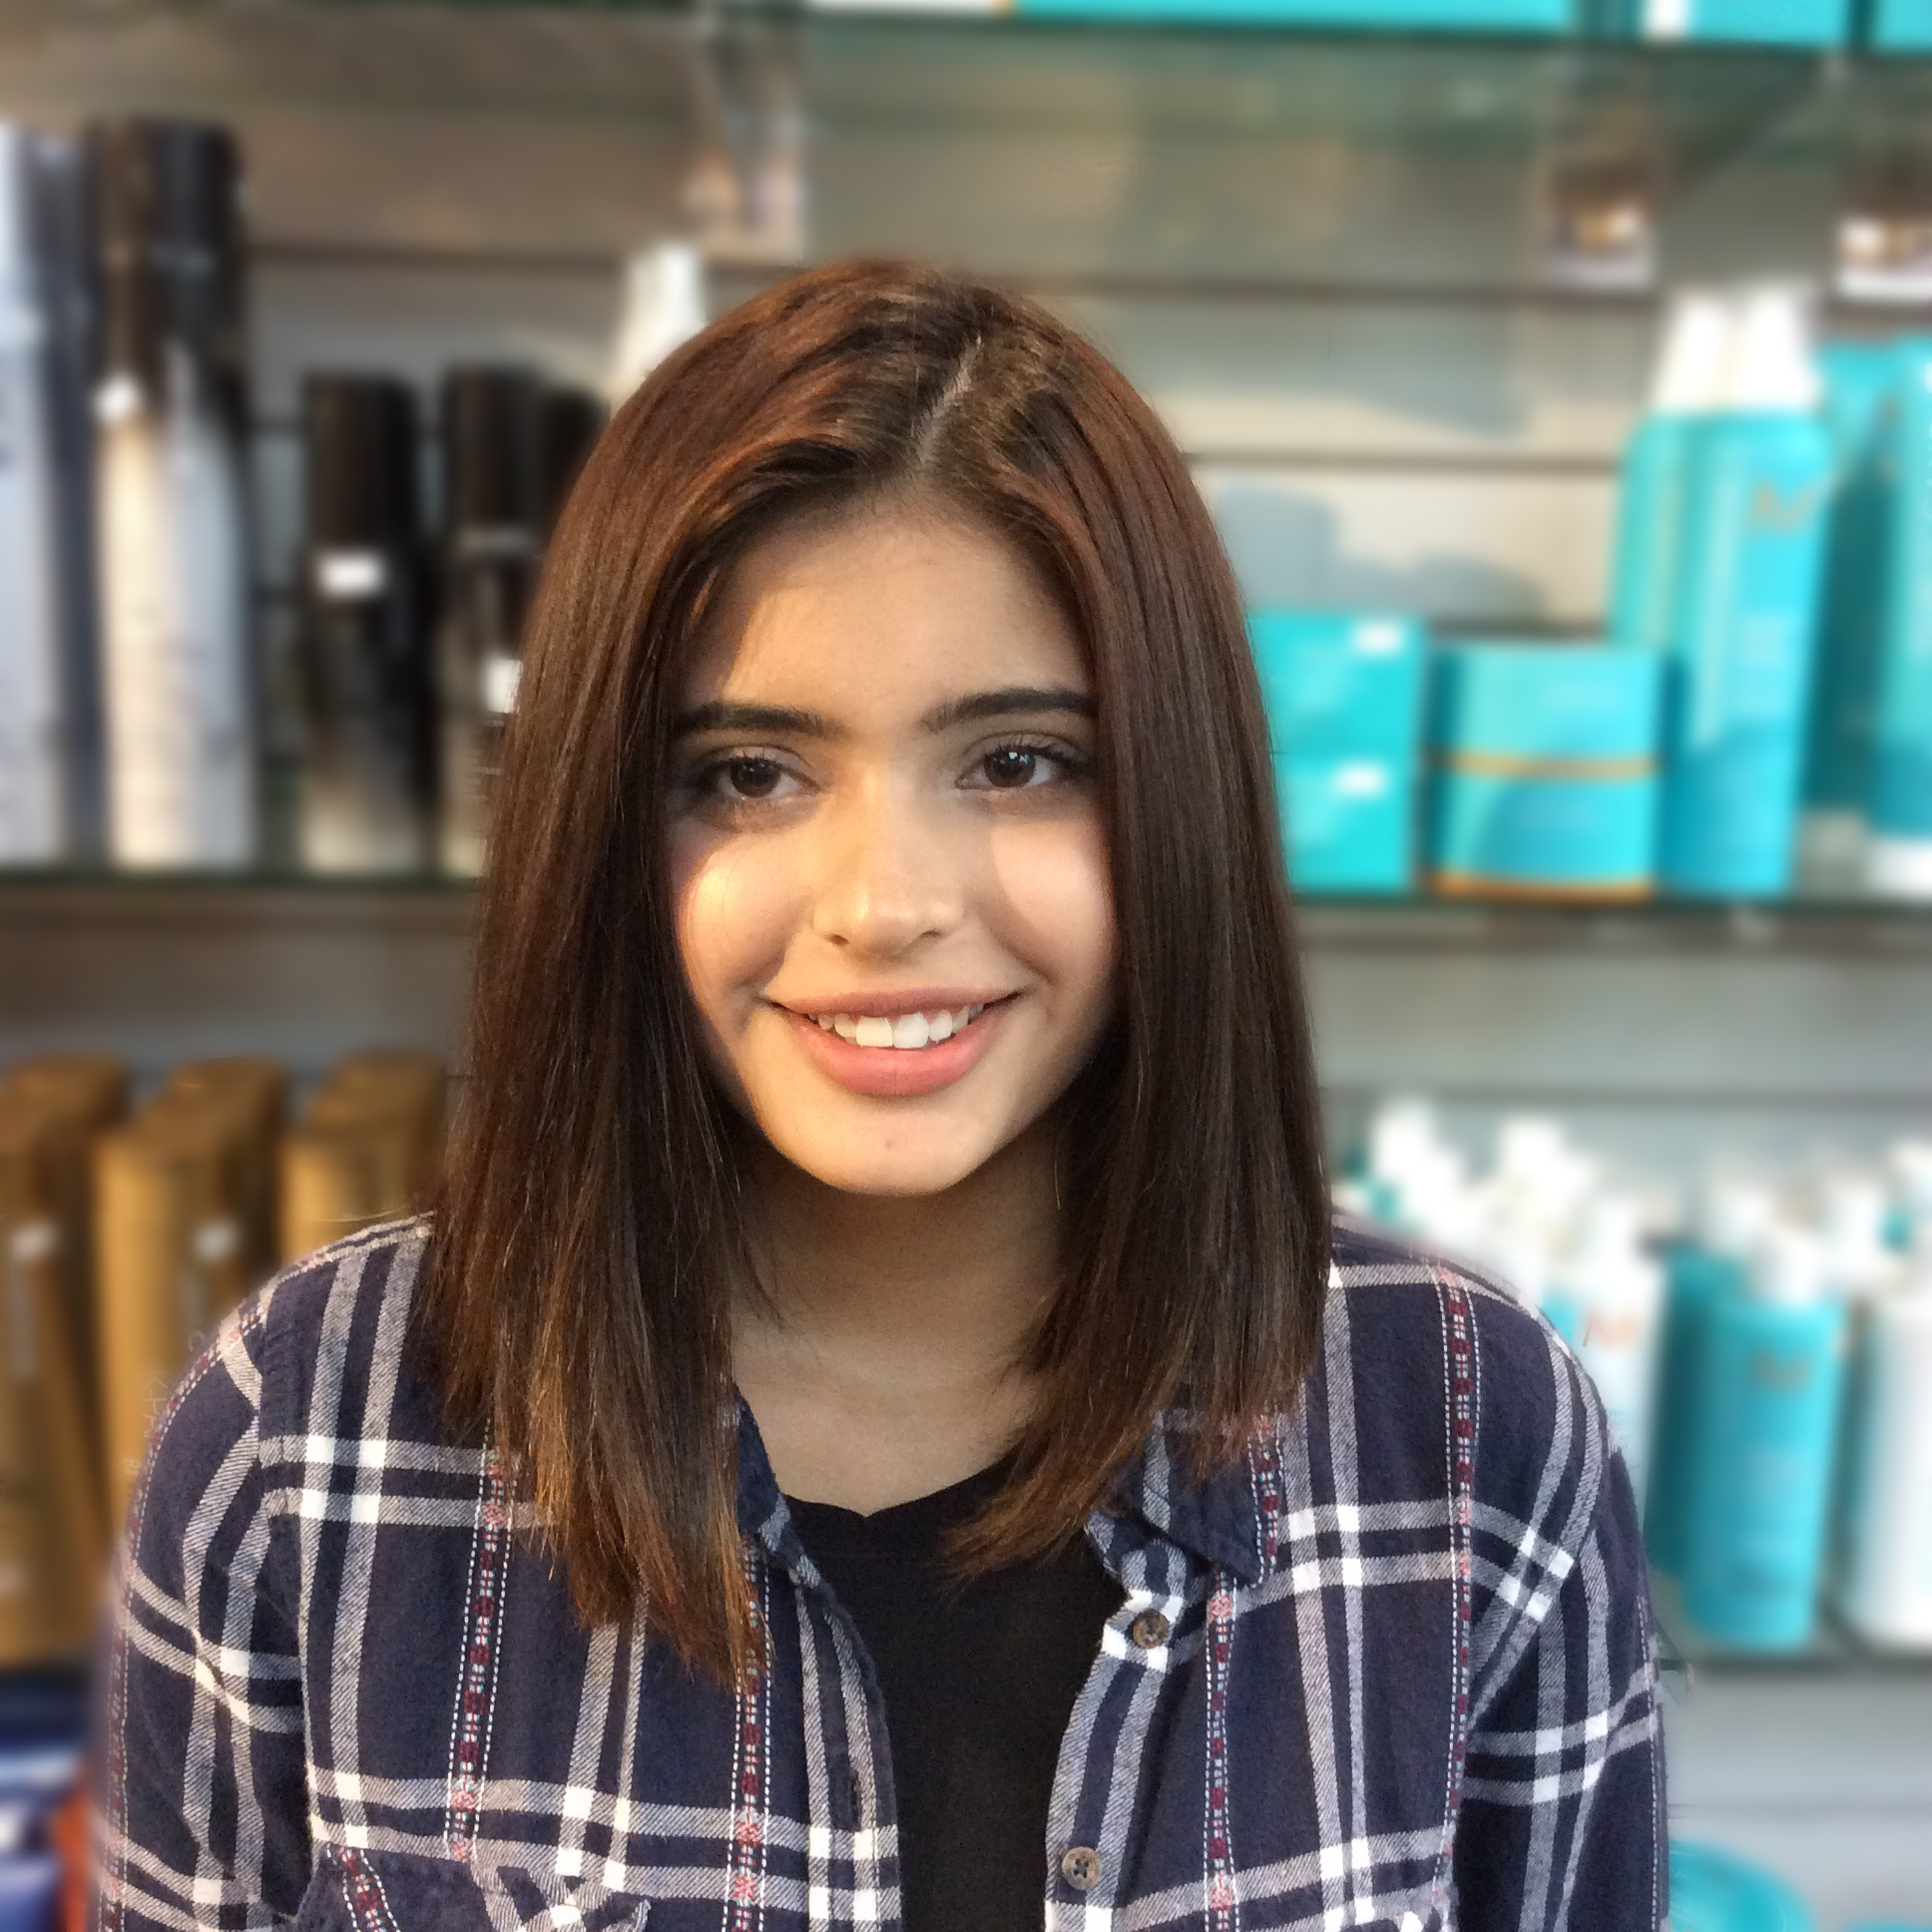 Female with blunt cut hair style at hairstyle inn saskatoon